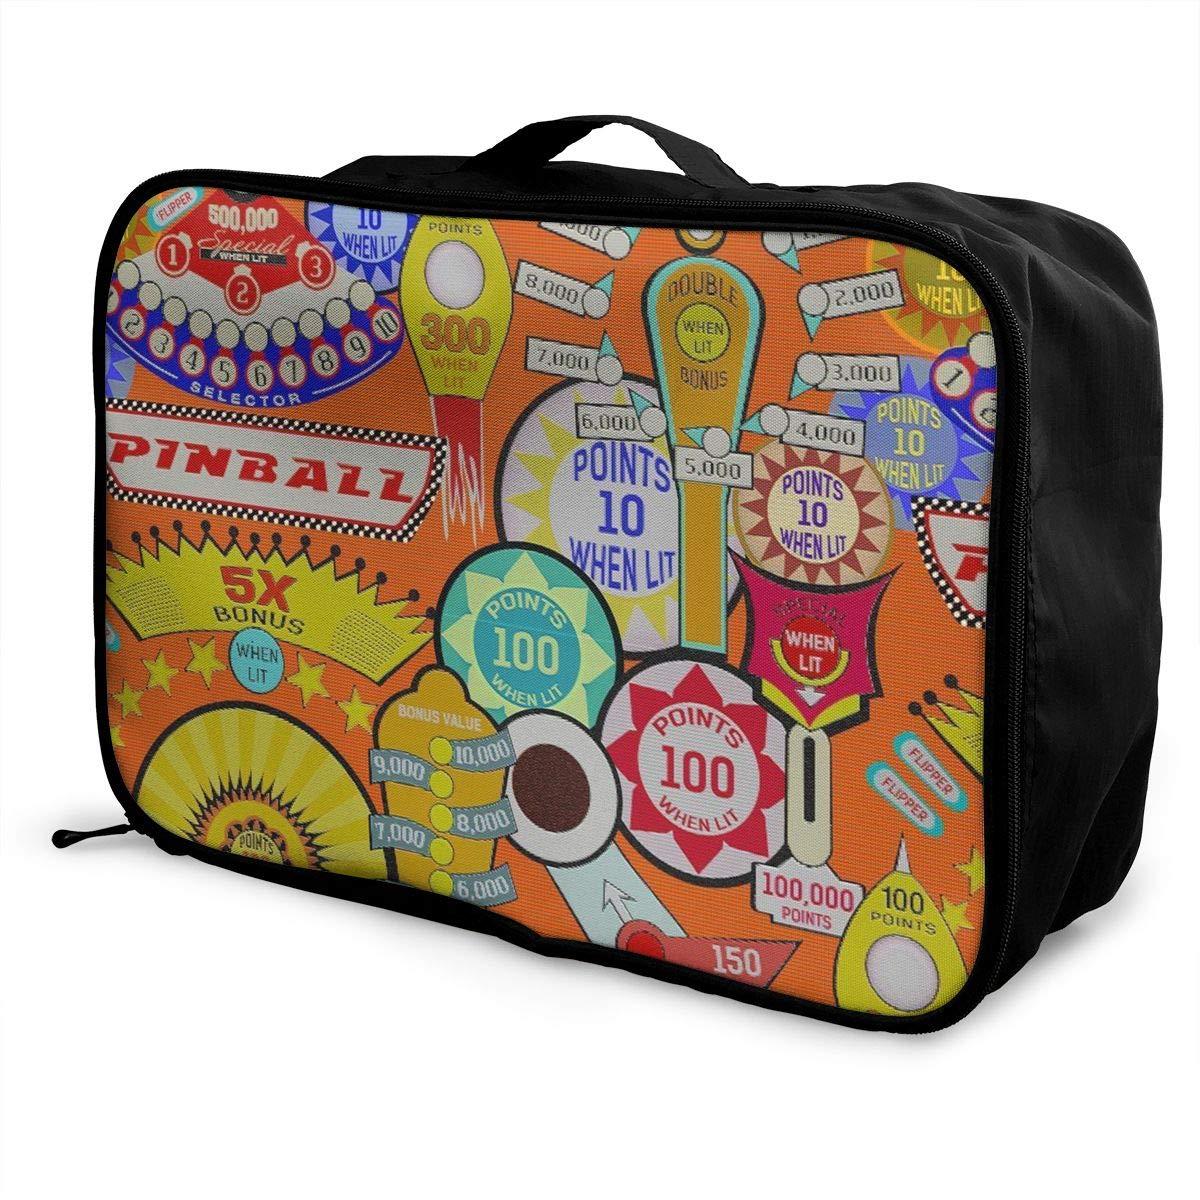 9fde6abc1ef5 Travel Duffle Bag Weekend Bags In Trolley Handle - Cartoon Pinball Orange  Luggage Hanging Bag Water Repellent Nylon Luggage Duffel Bag Tote Luggage  Bag For ...